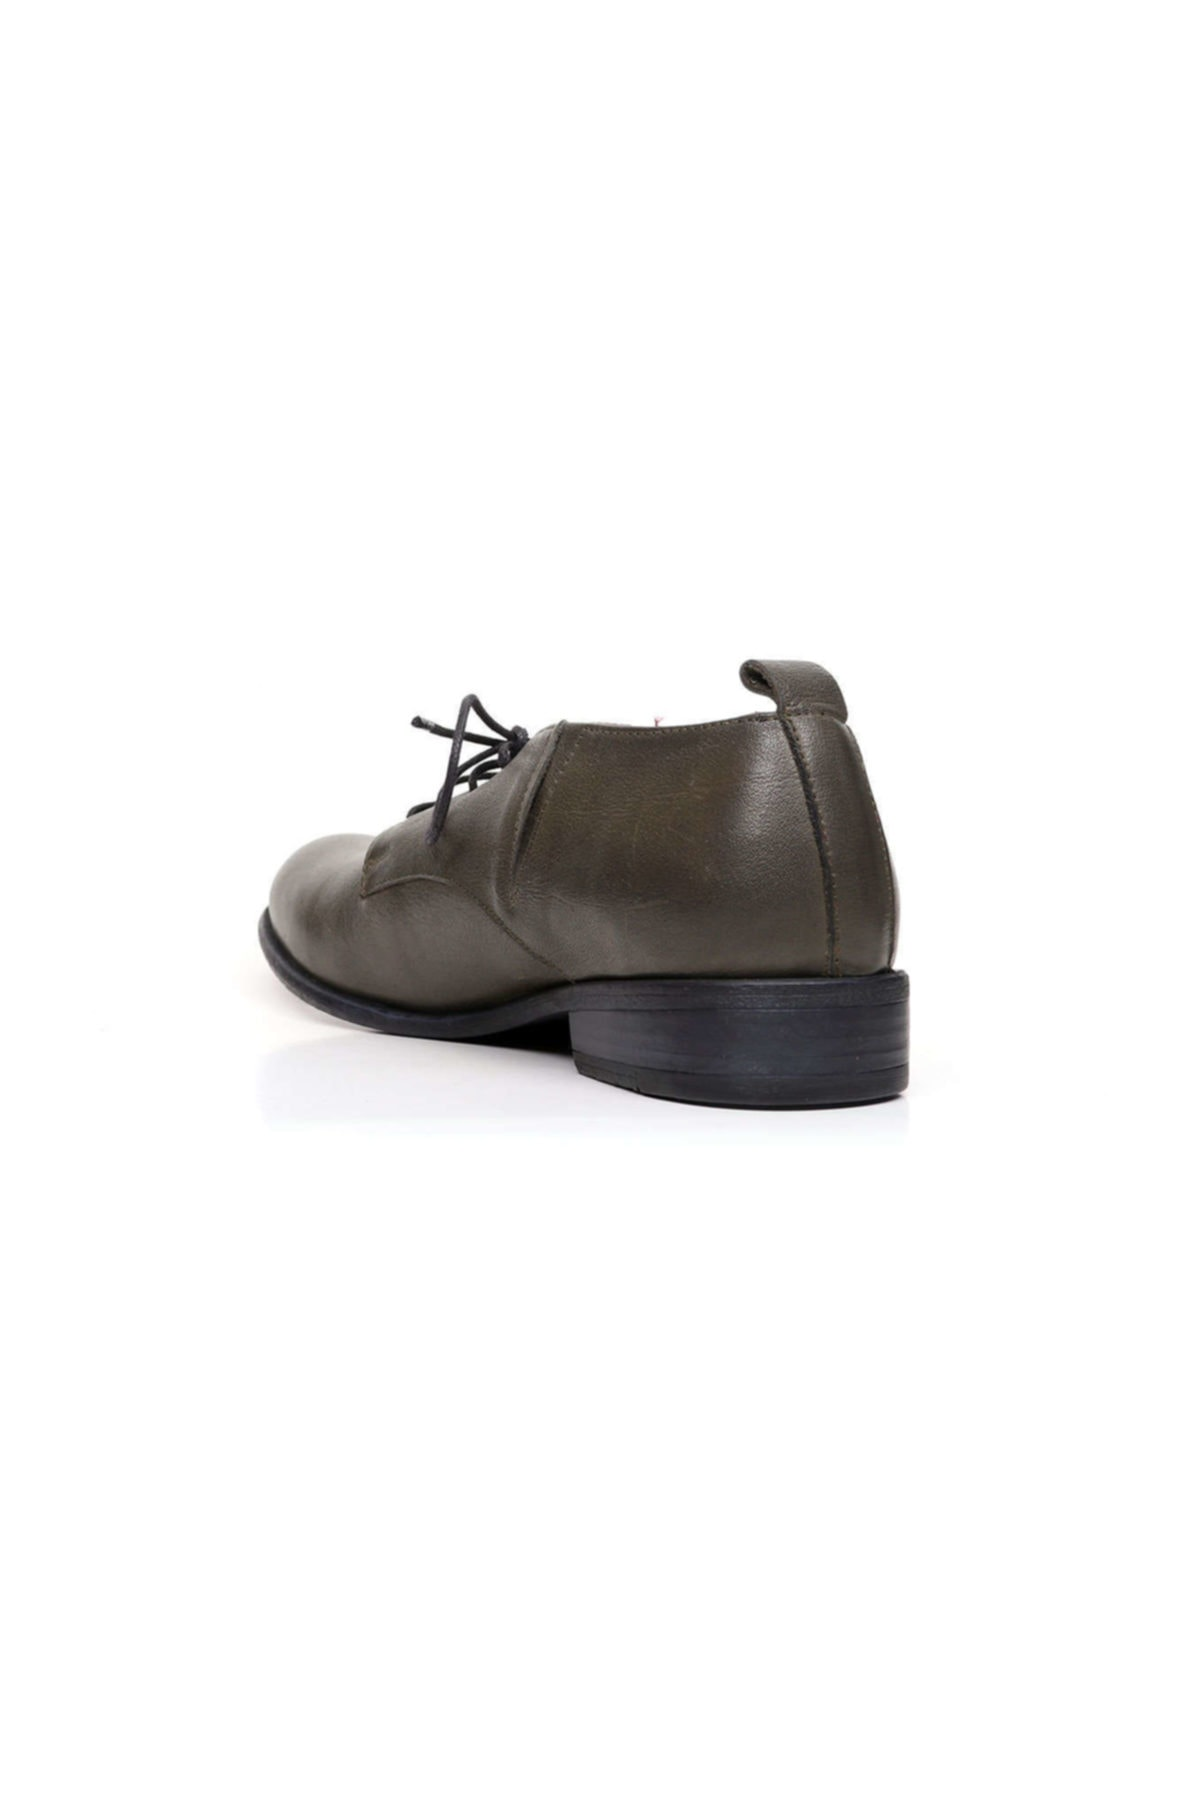 BUENO Shoes  Kadın Ayakkabı 9p1704 2